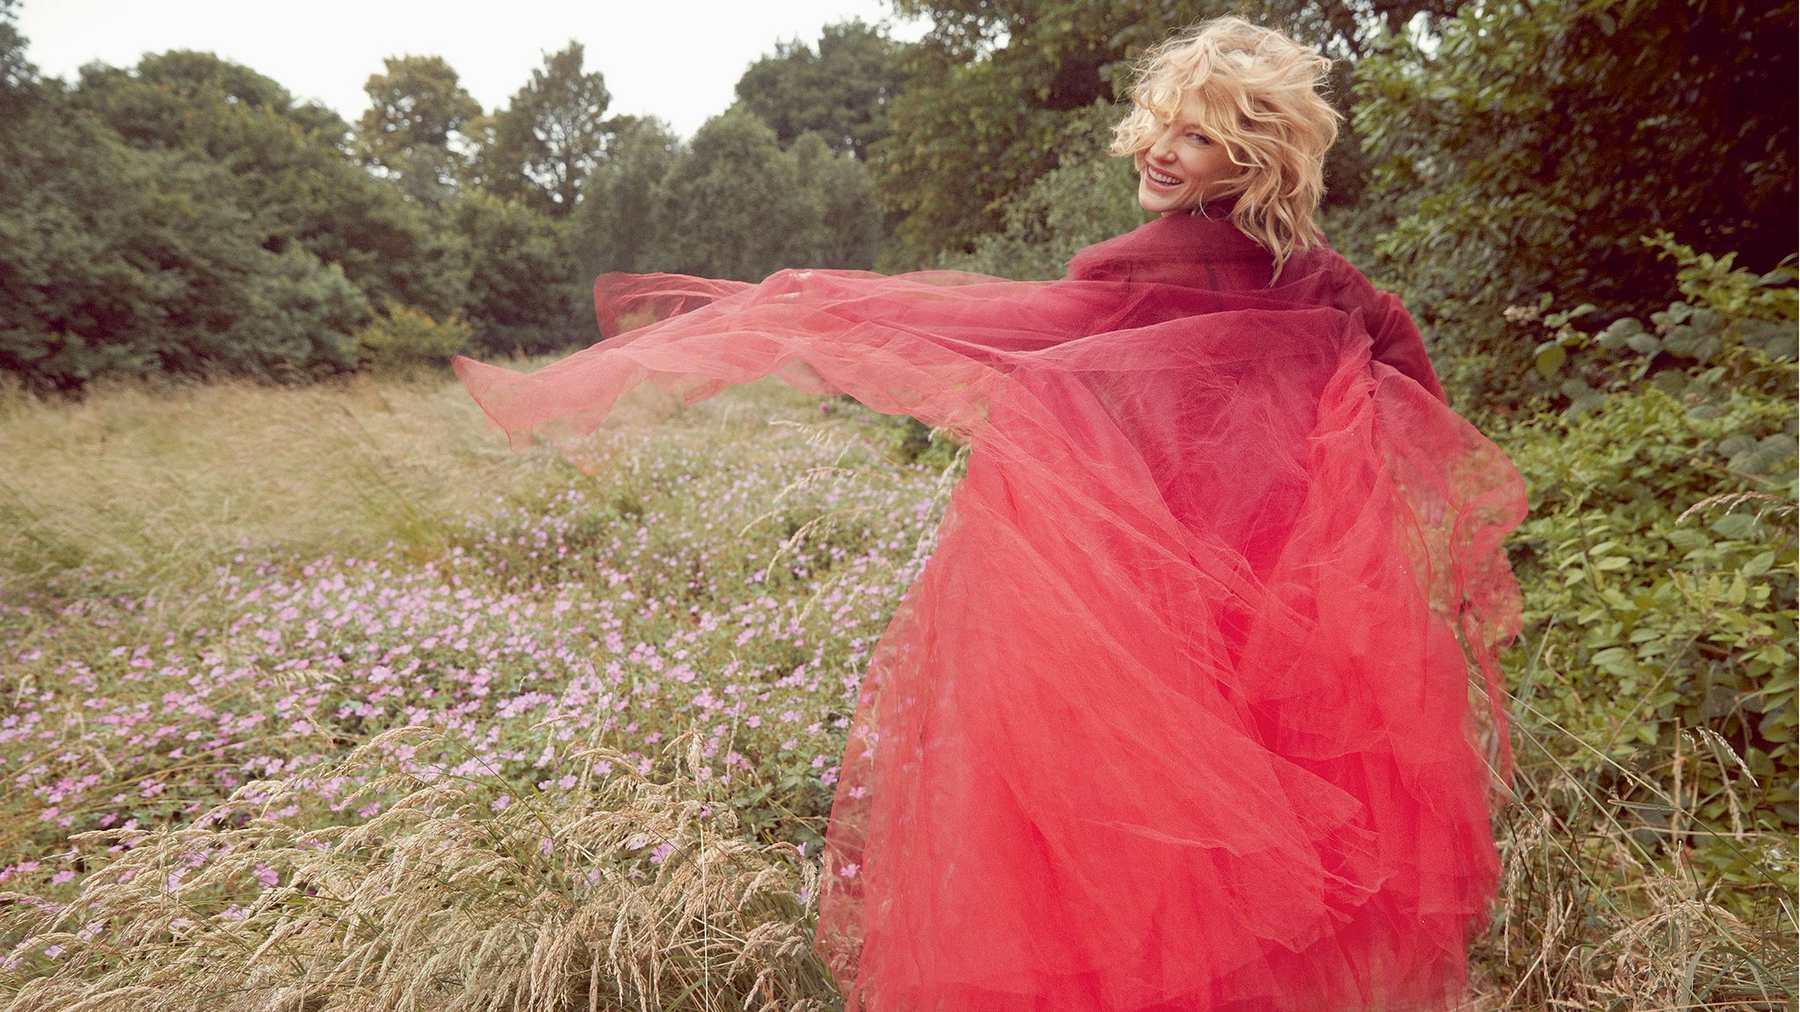 Cate-Blanchett-UK-Harper's-Bazaar-October-2018f3f6c0959145484.jpg